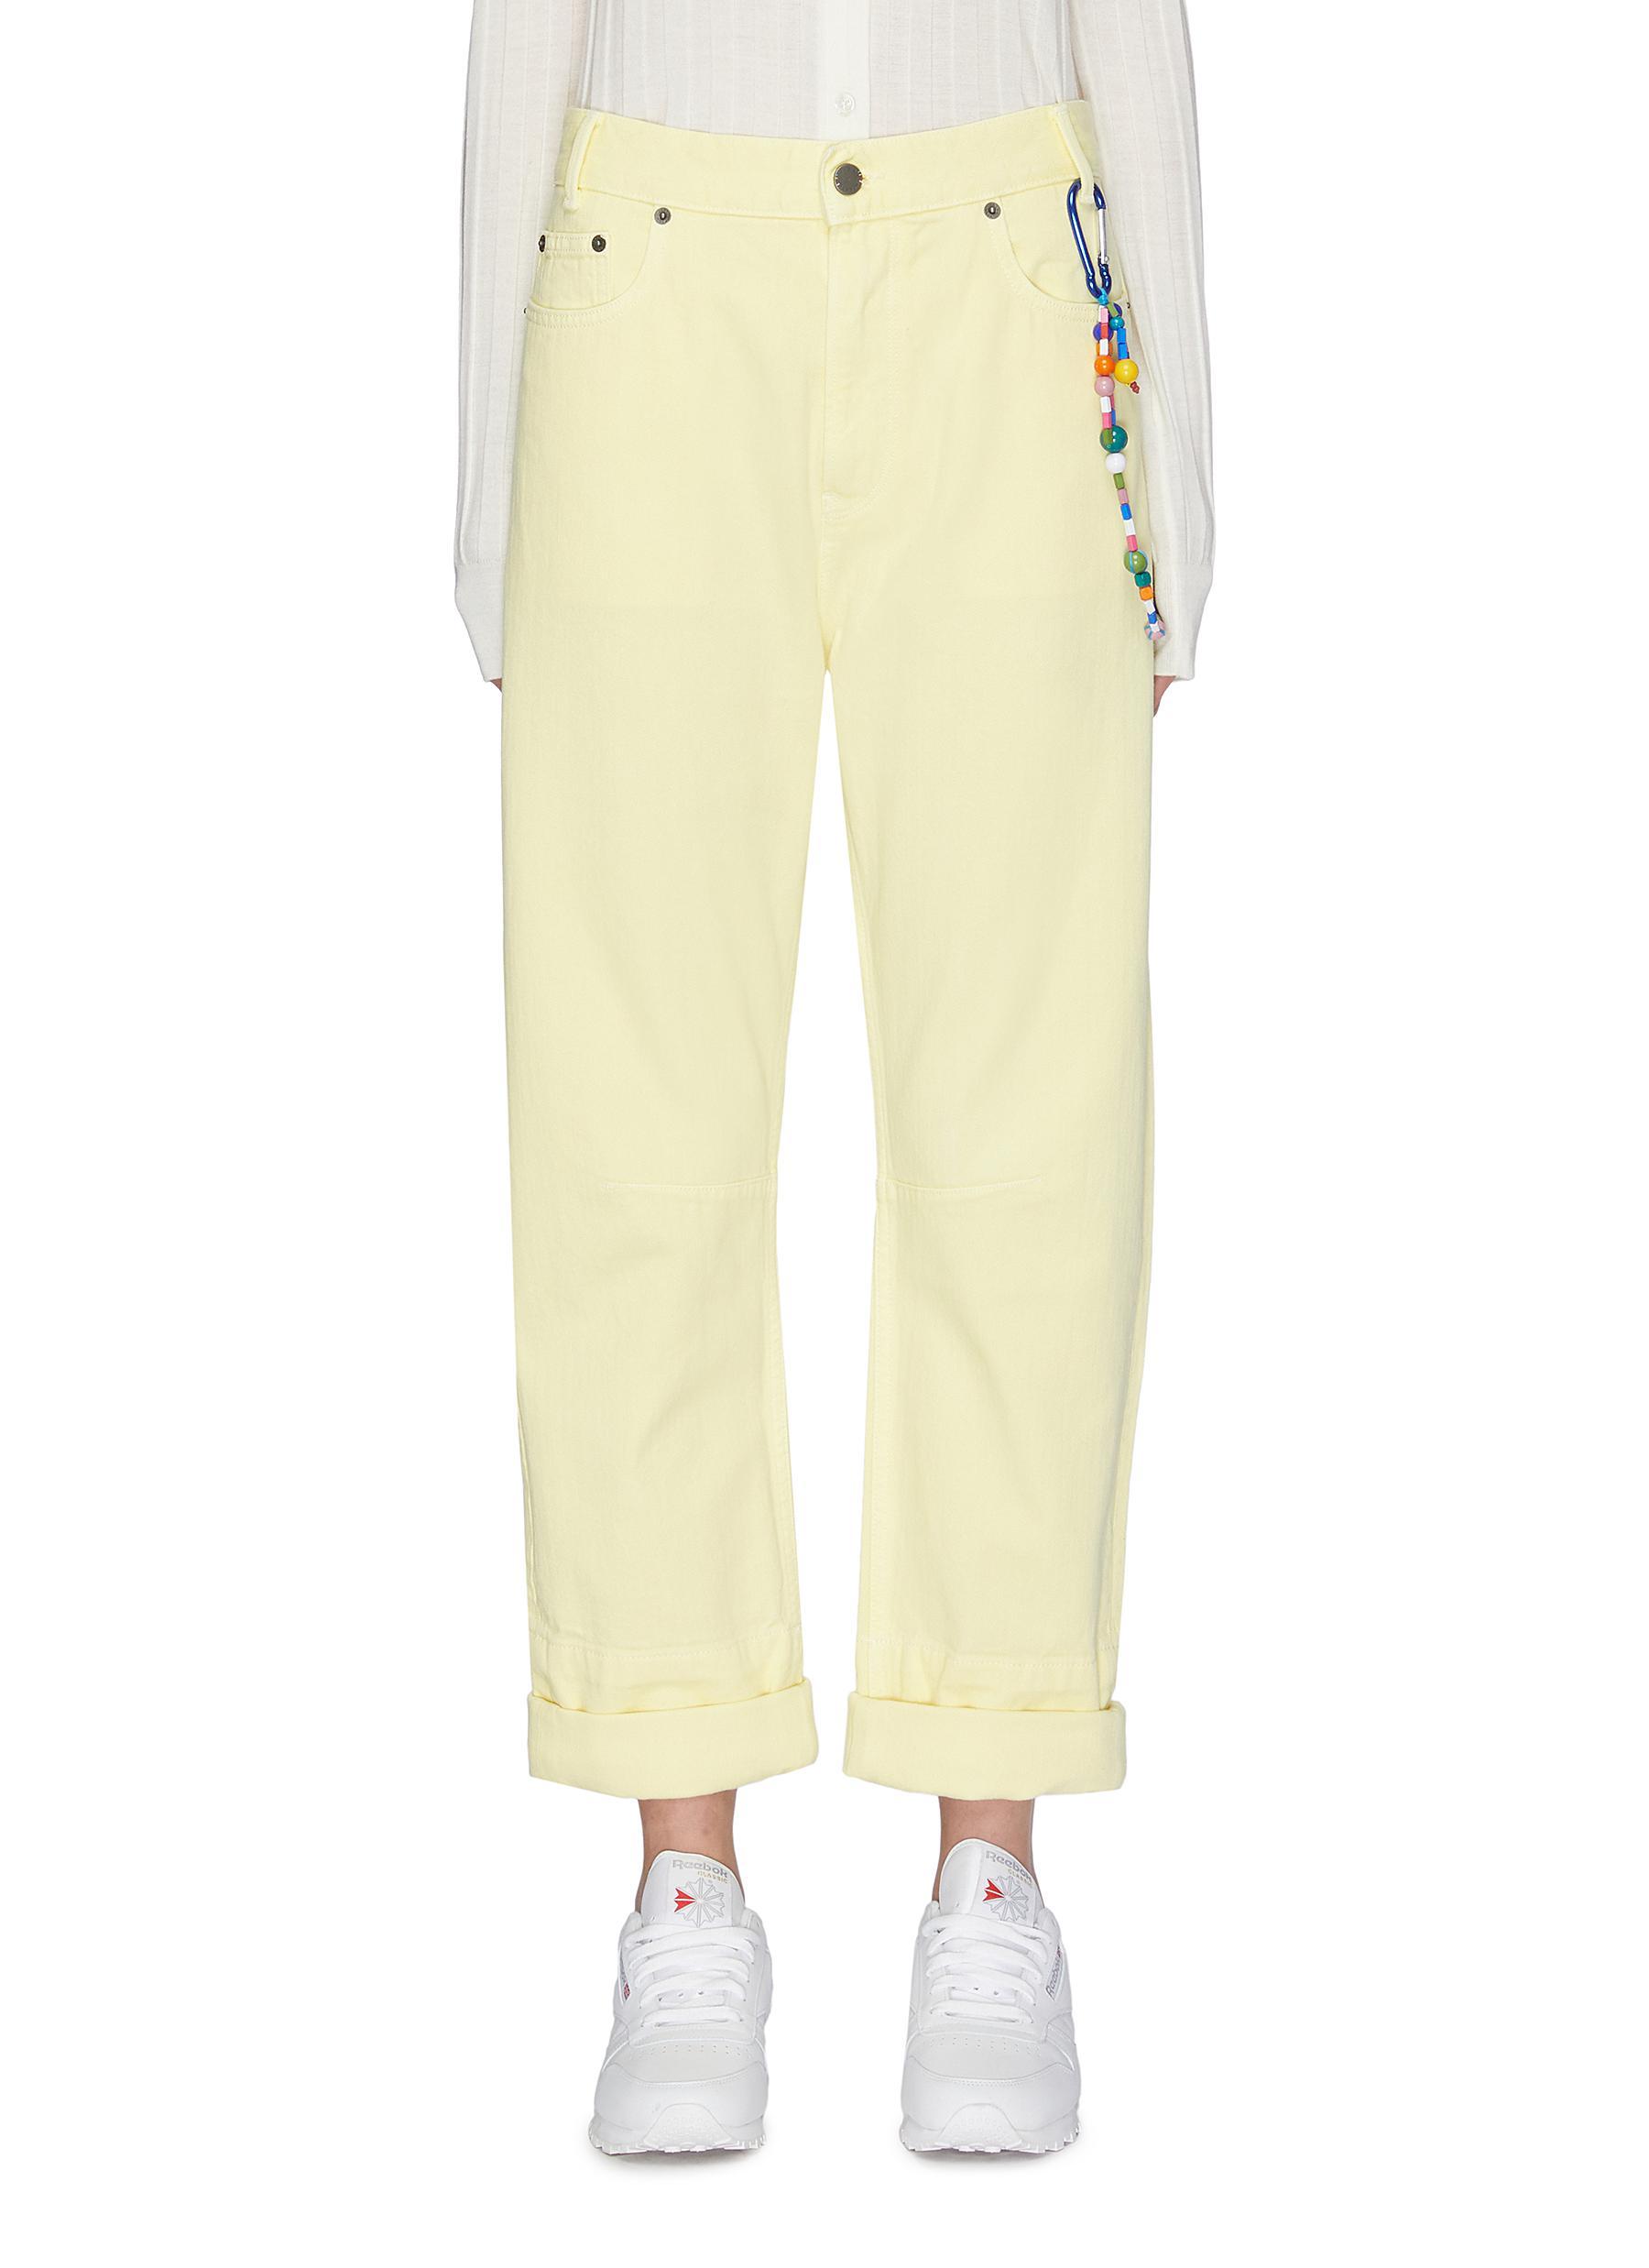 Buy Mira Mikati Jeans Keyring Spray Paint Jeans